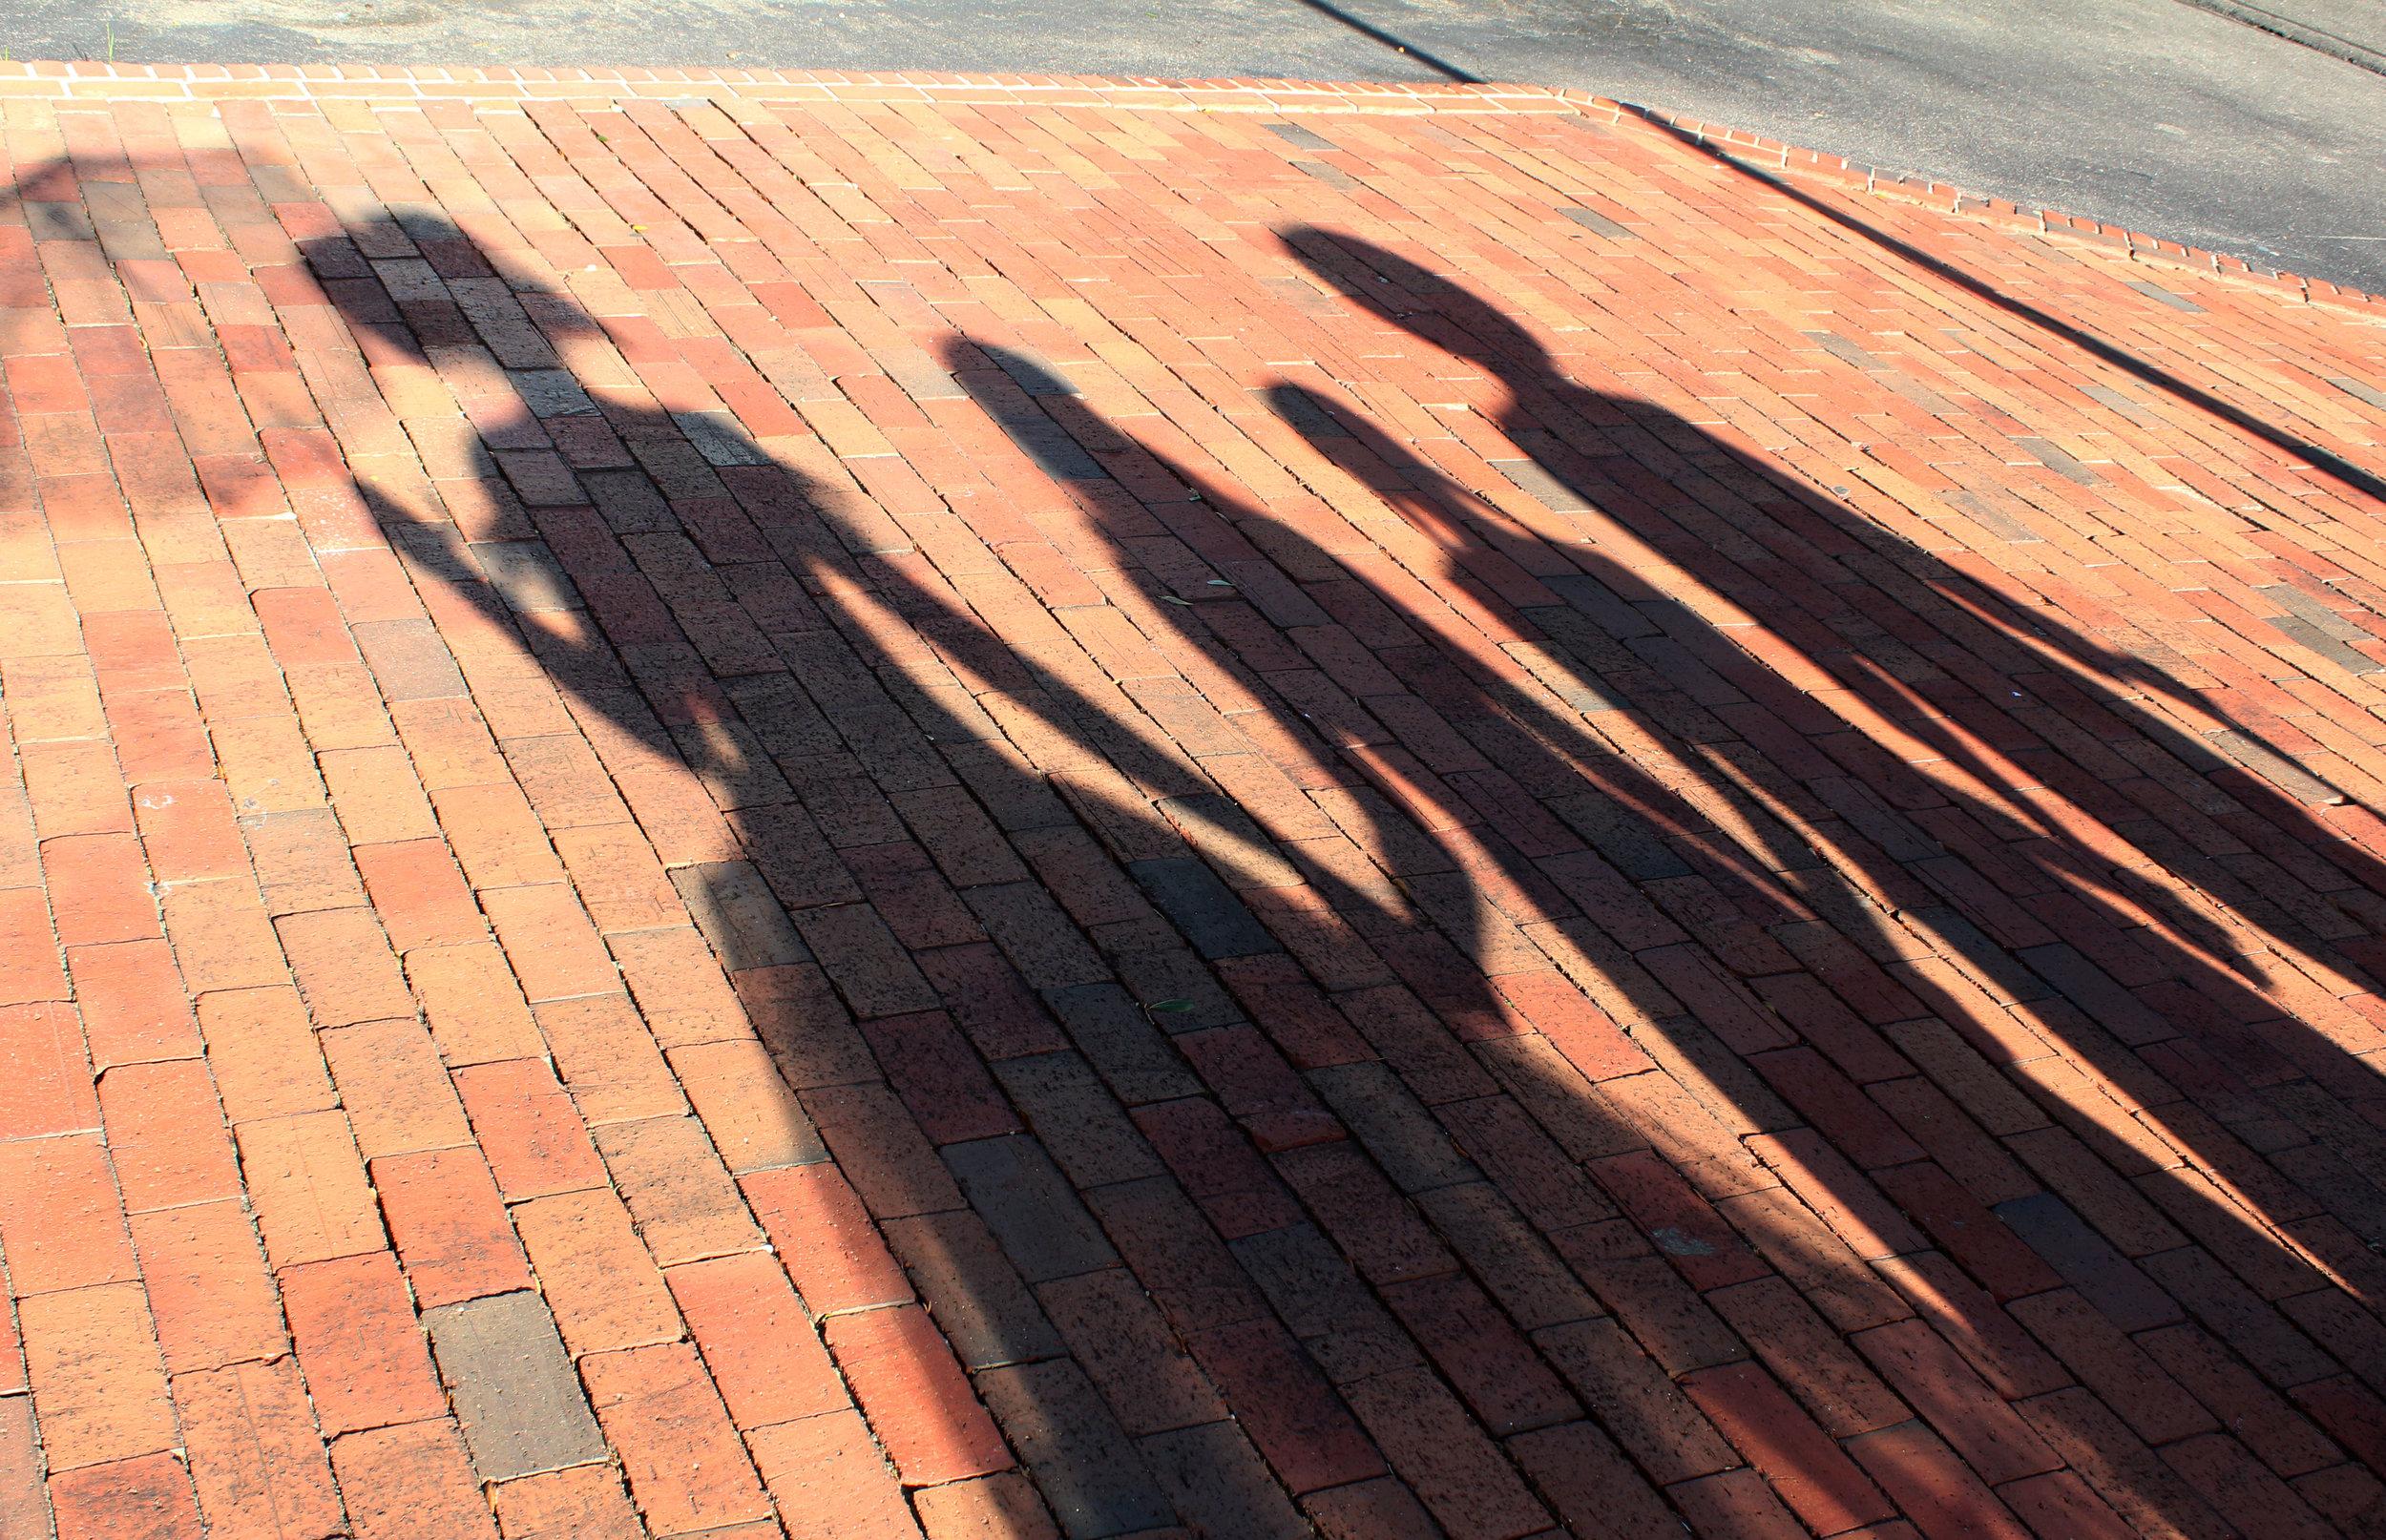 Shadow - IMG_1227.JPG